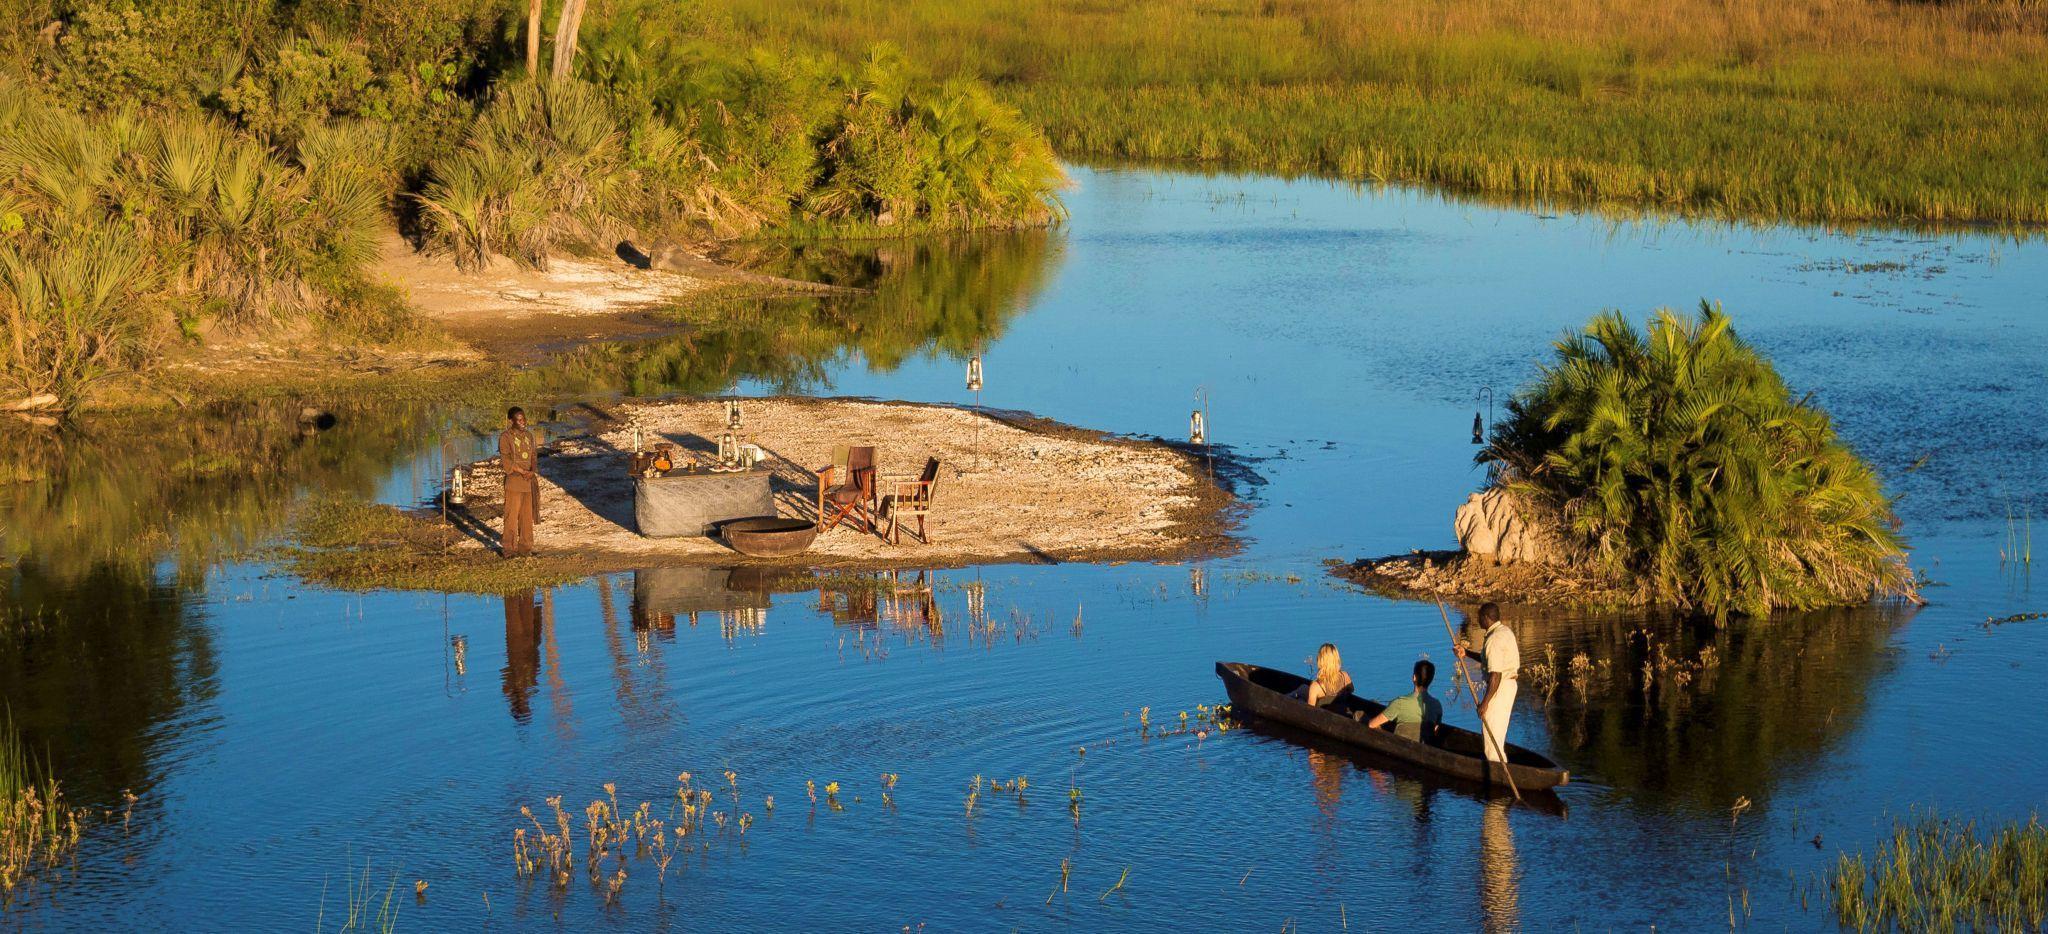 Paar mit Guide in Kanu beobachten Tiere im Fluss